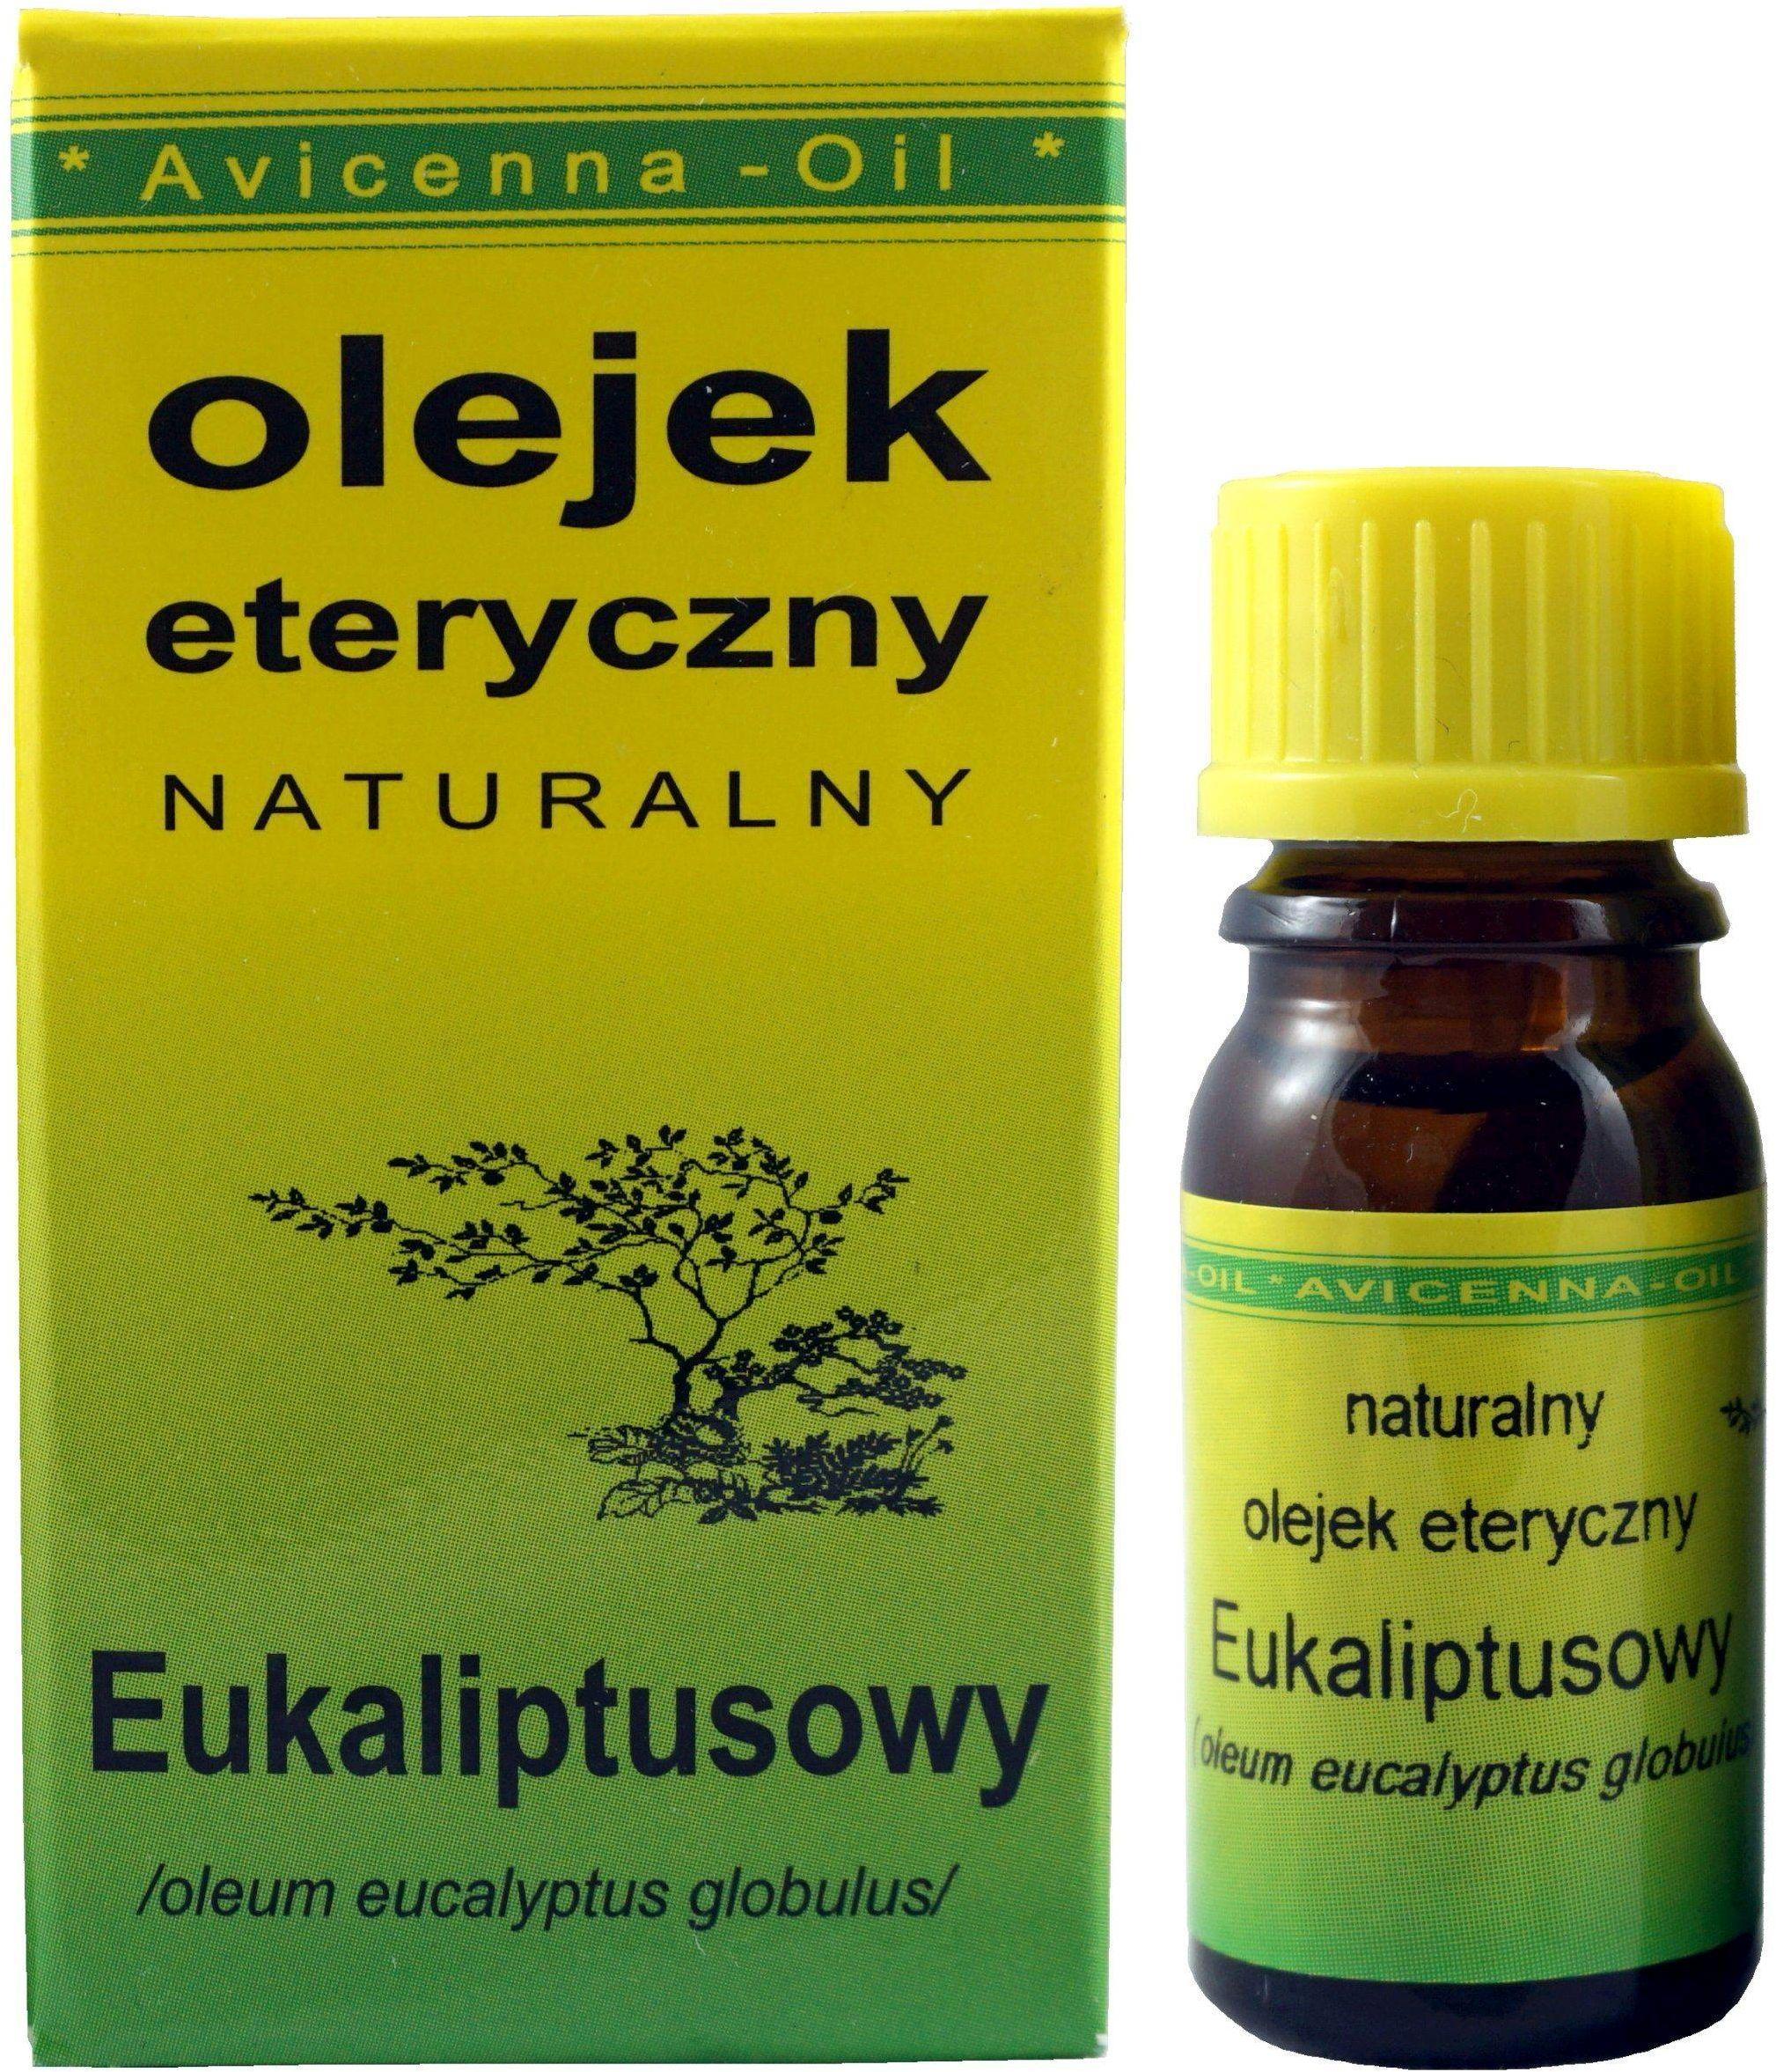 Olejek eteryczny Eukaliptus - 7ml - Avicenna Oil